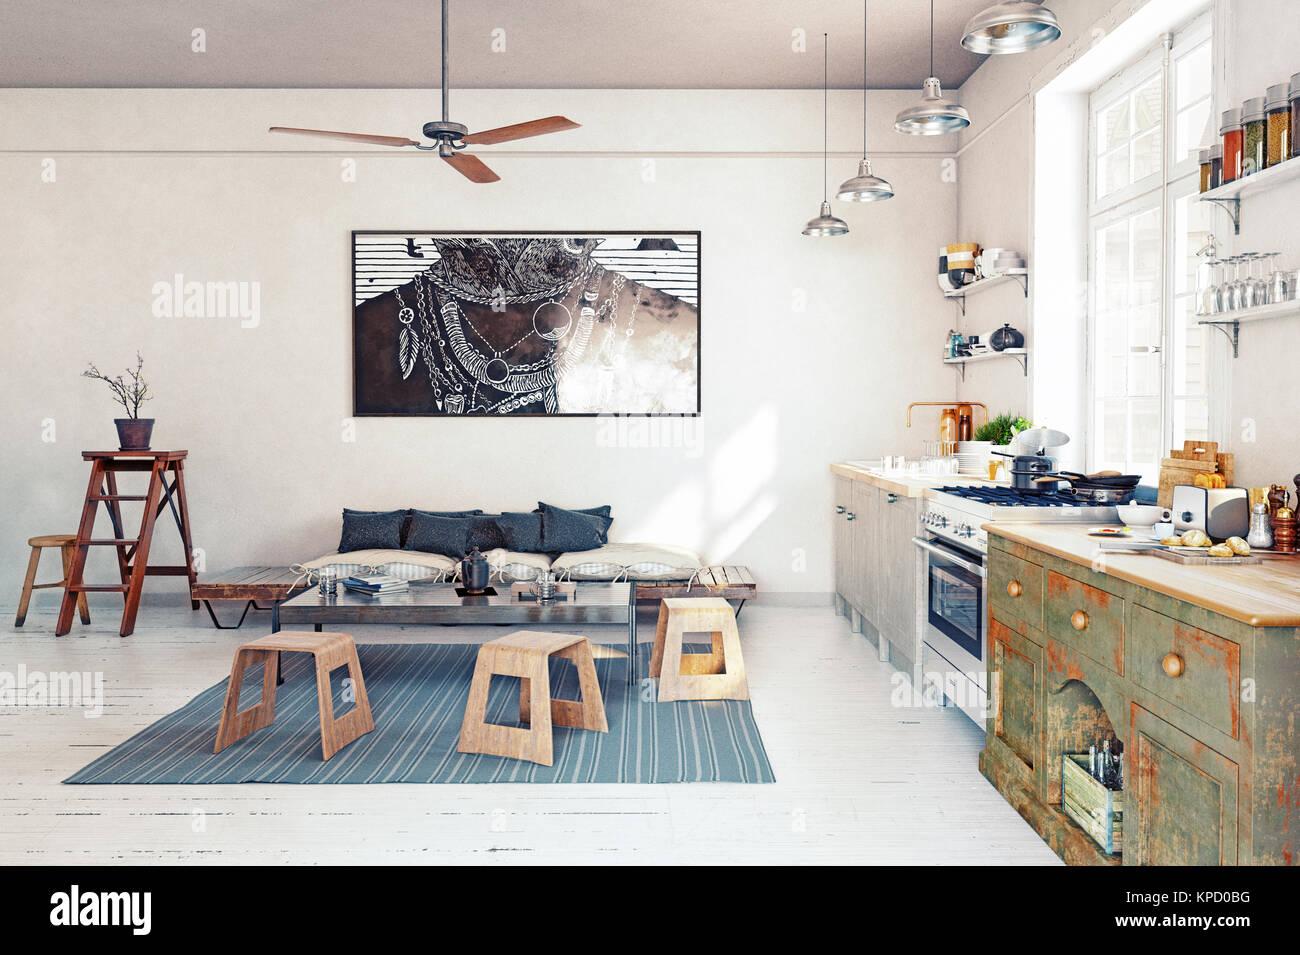 Modernes Design Küche Interieur. 3D-rendering Konzept Stockfoto ...